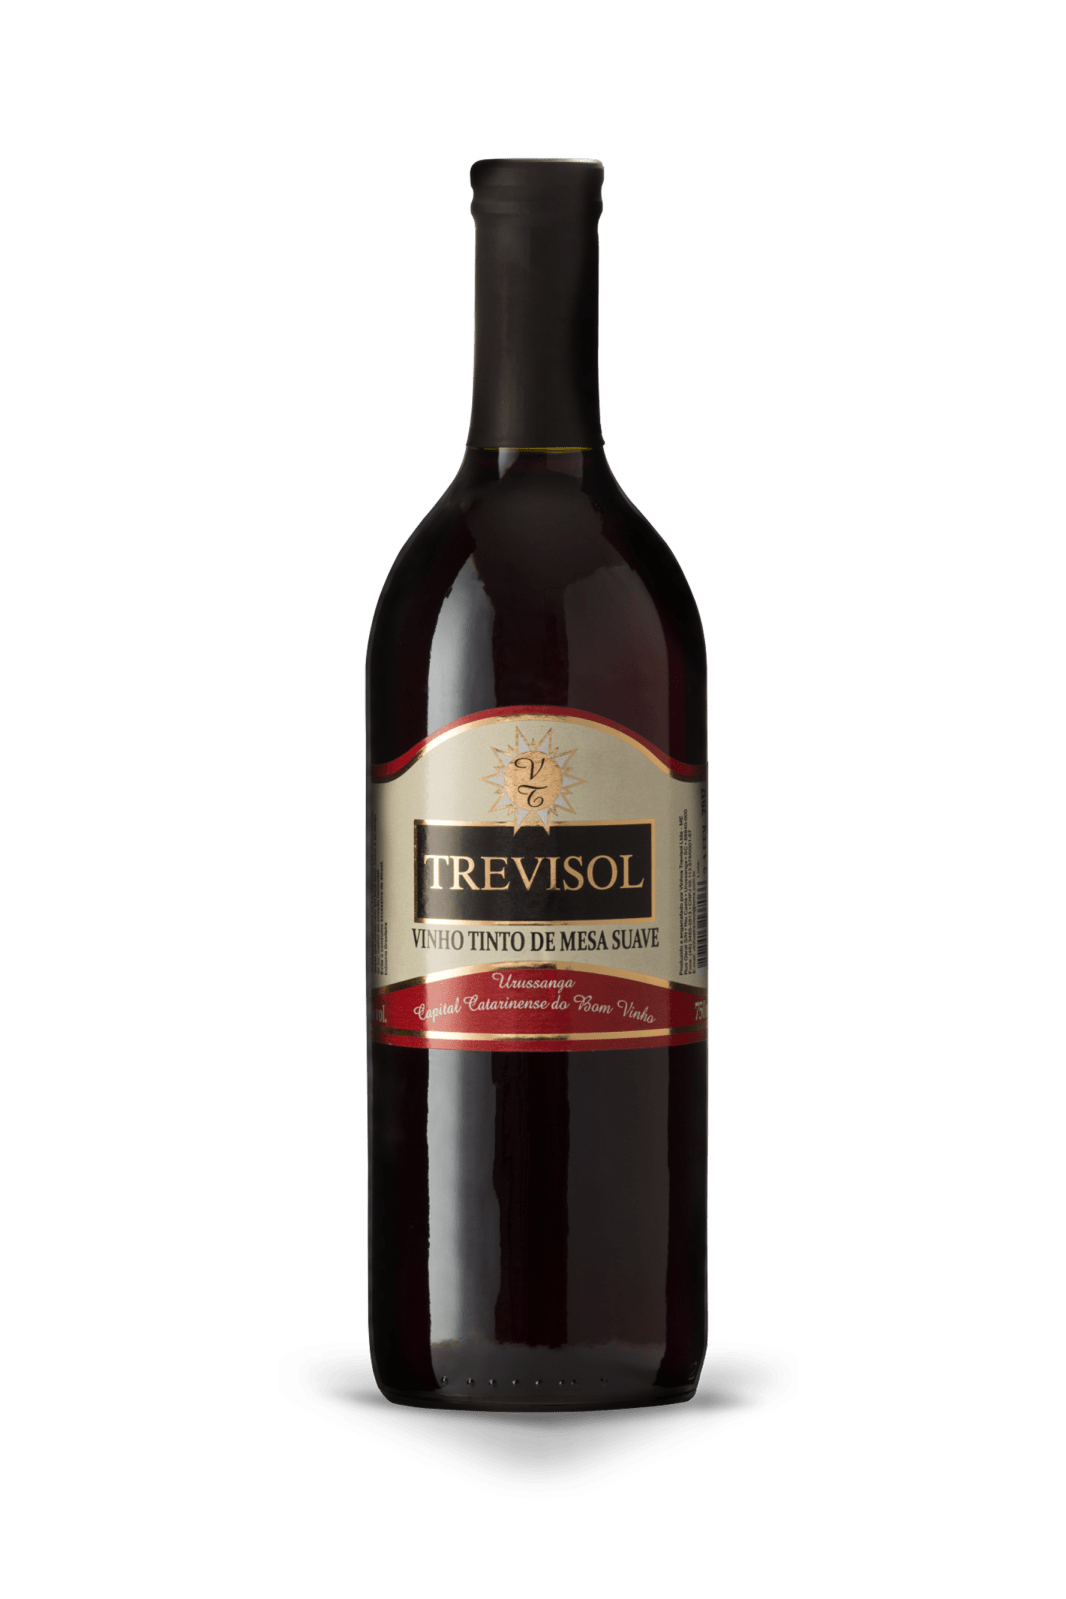 Vinho Trevisol Tinto Suave